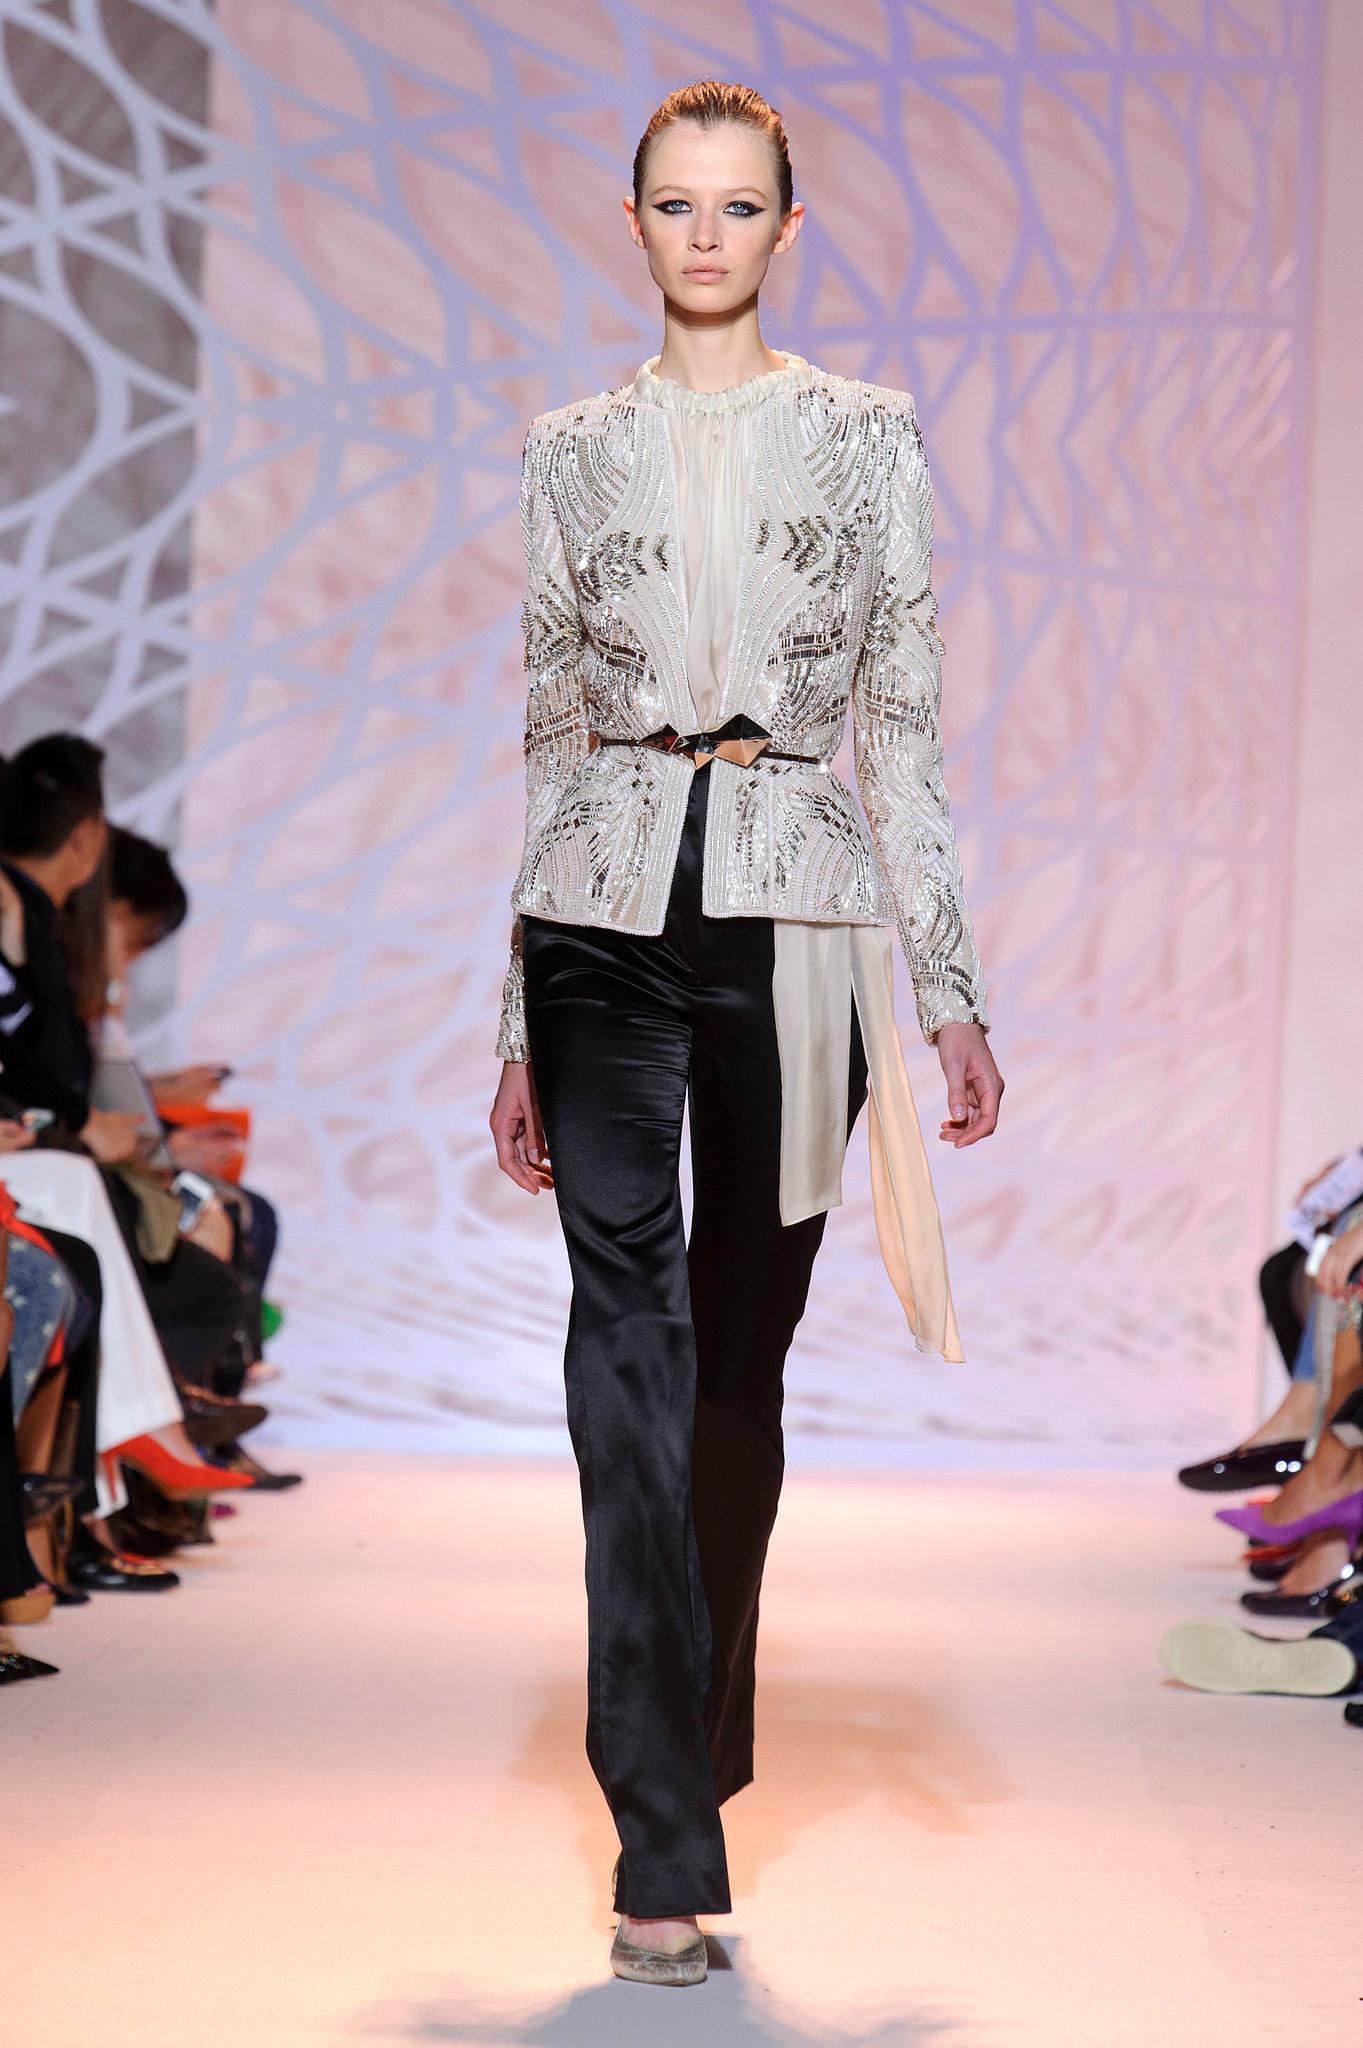 Zuhair-Murad-Haute-Couture-Fall-2014